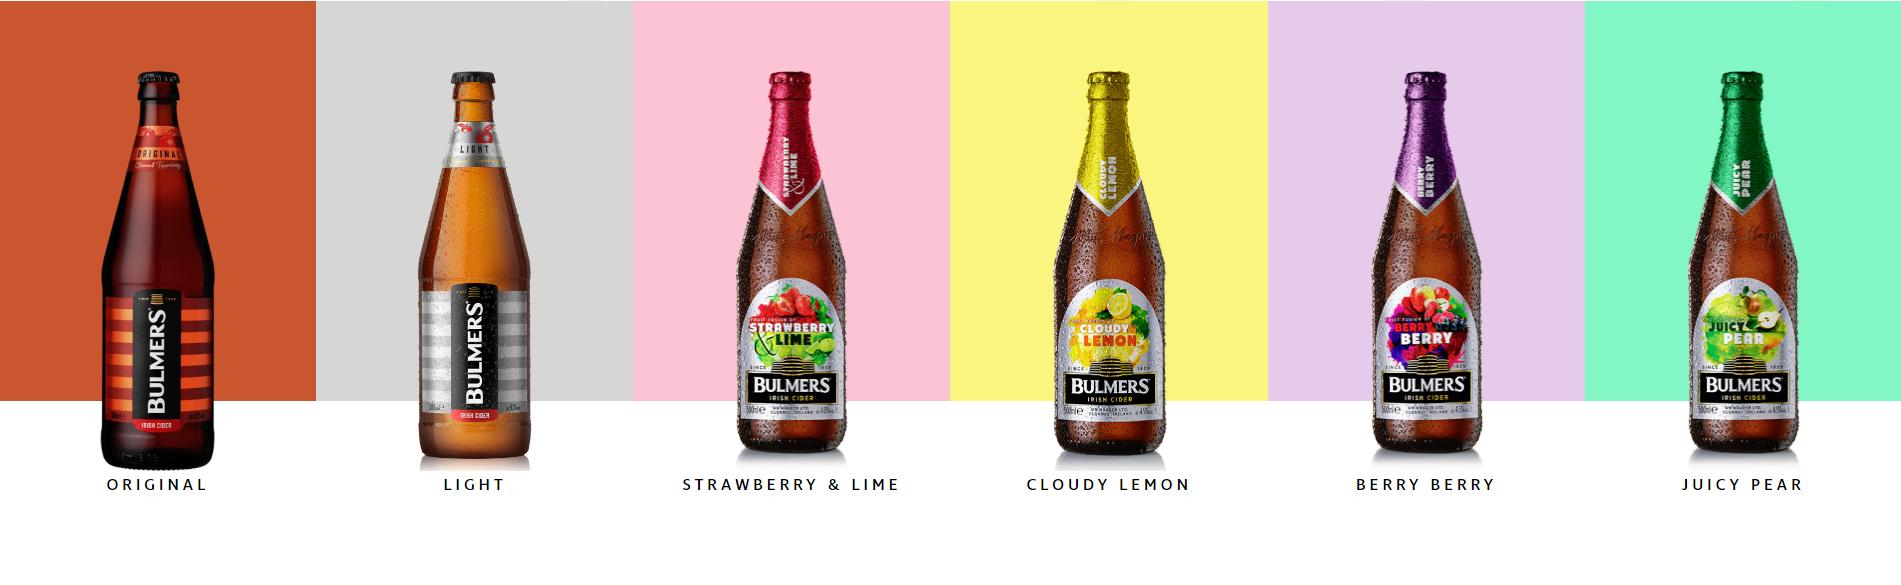 Bulmers Cider Brand Refresh